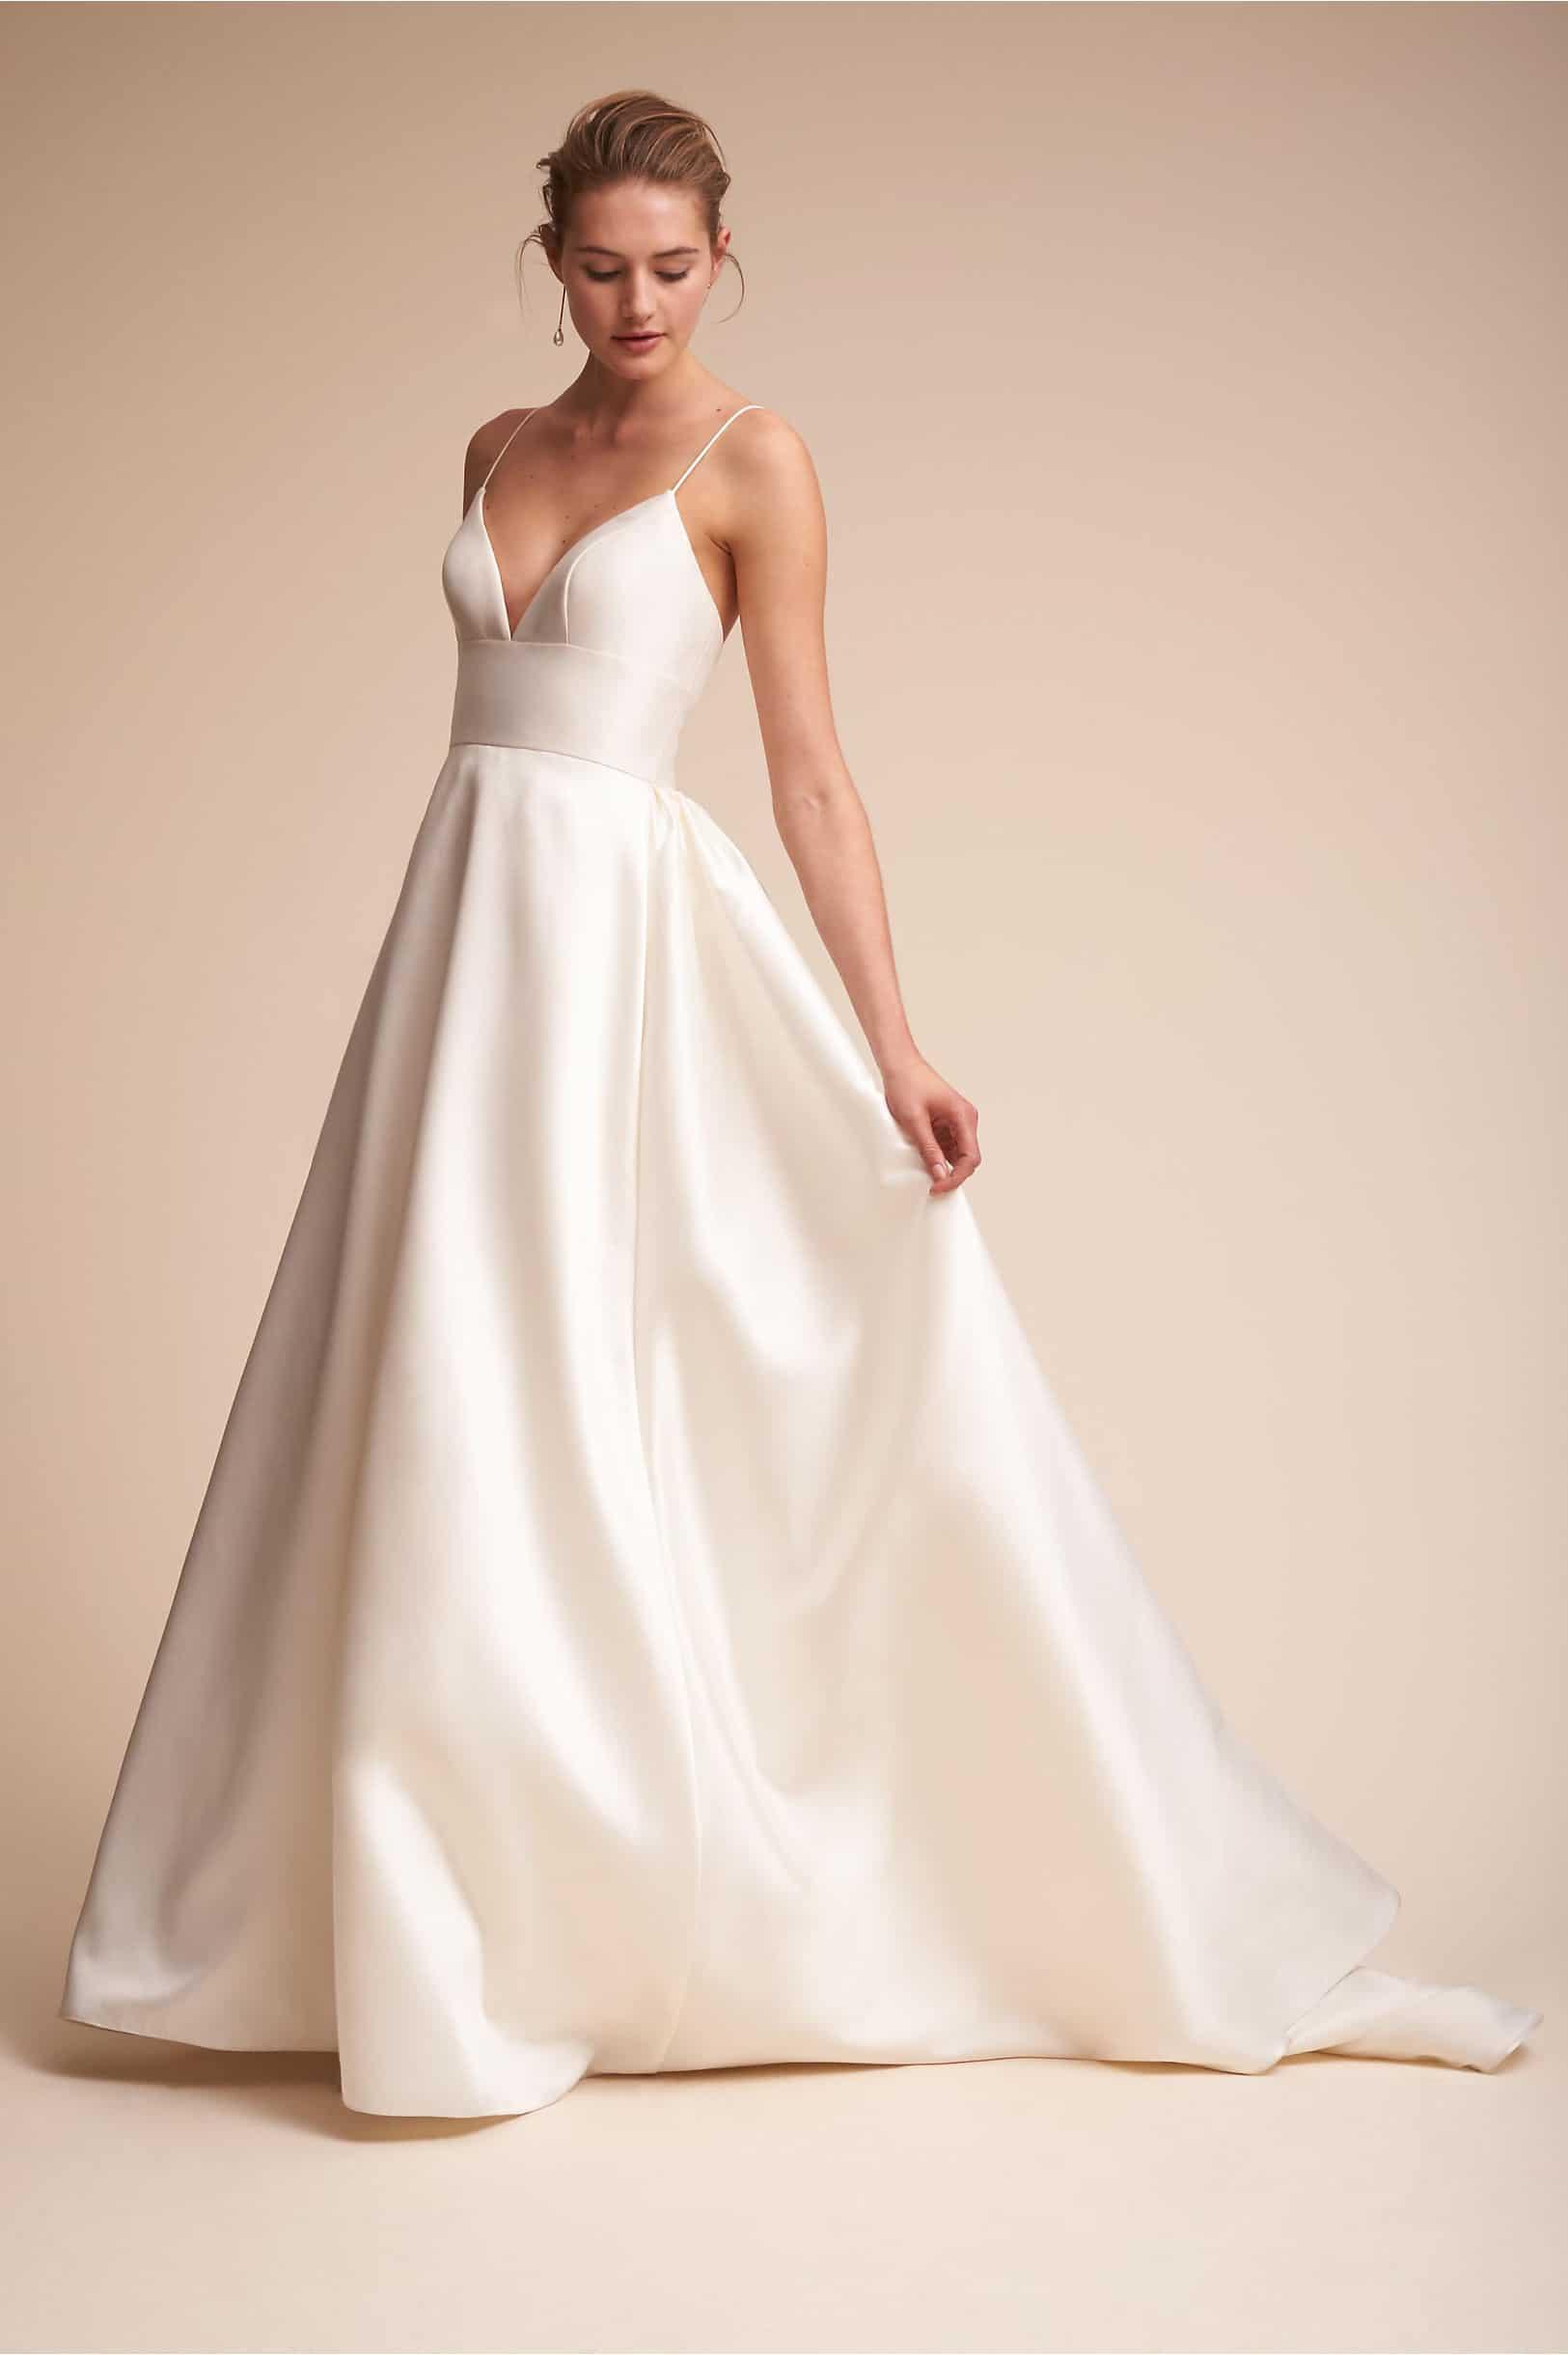 Ivory Satin Ball Gown Wedding Dress with Spaghetti Straps